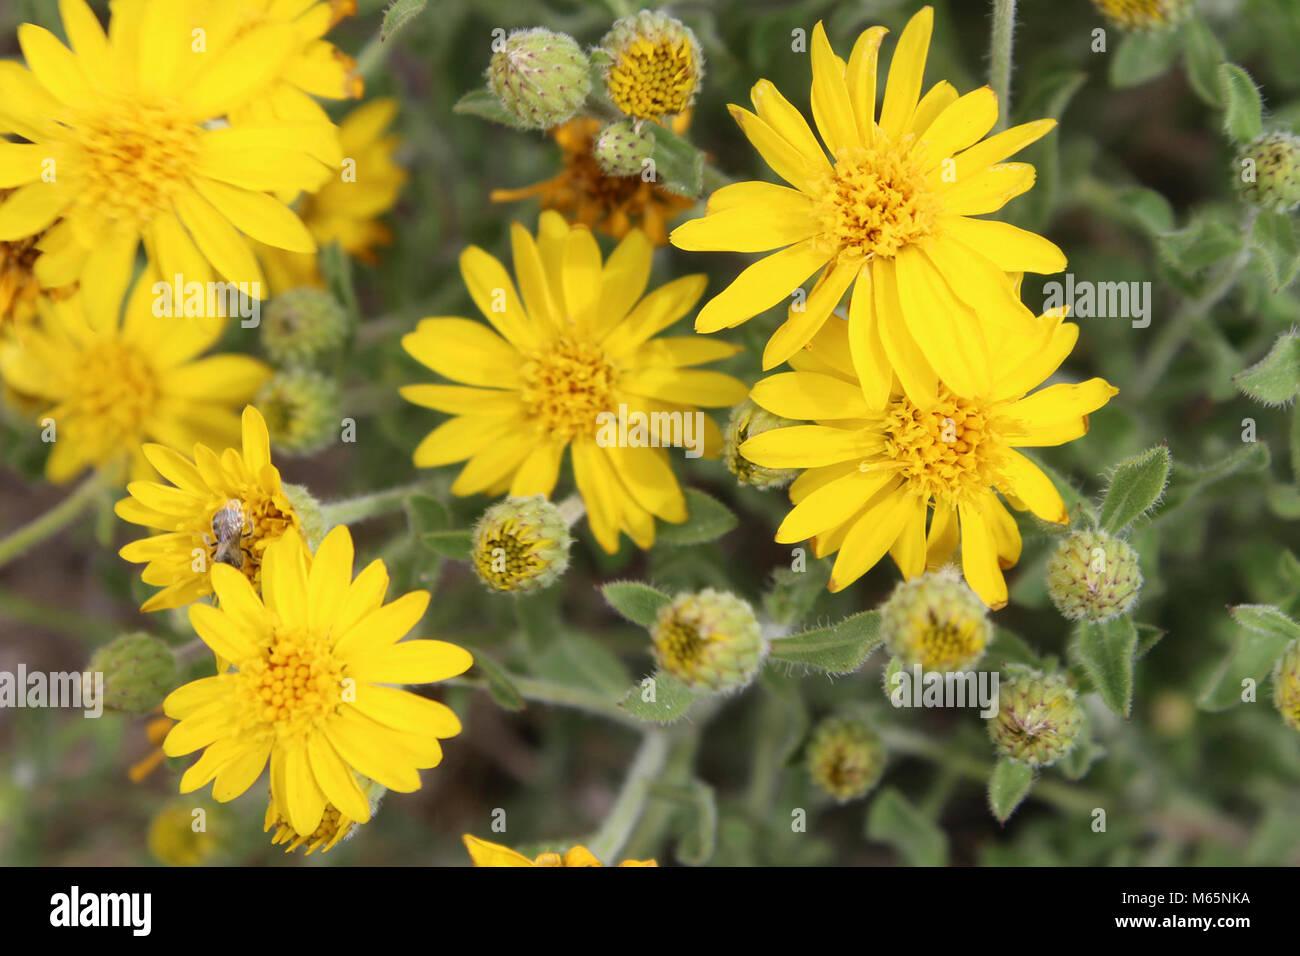 False goldenaster peludo (Heterotheca villosa). 05-14-17_9152 Foto de stock